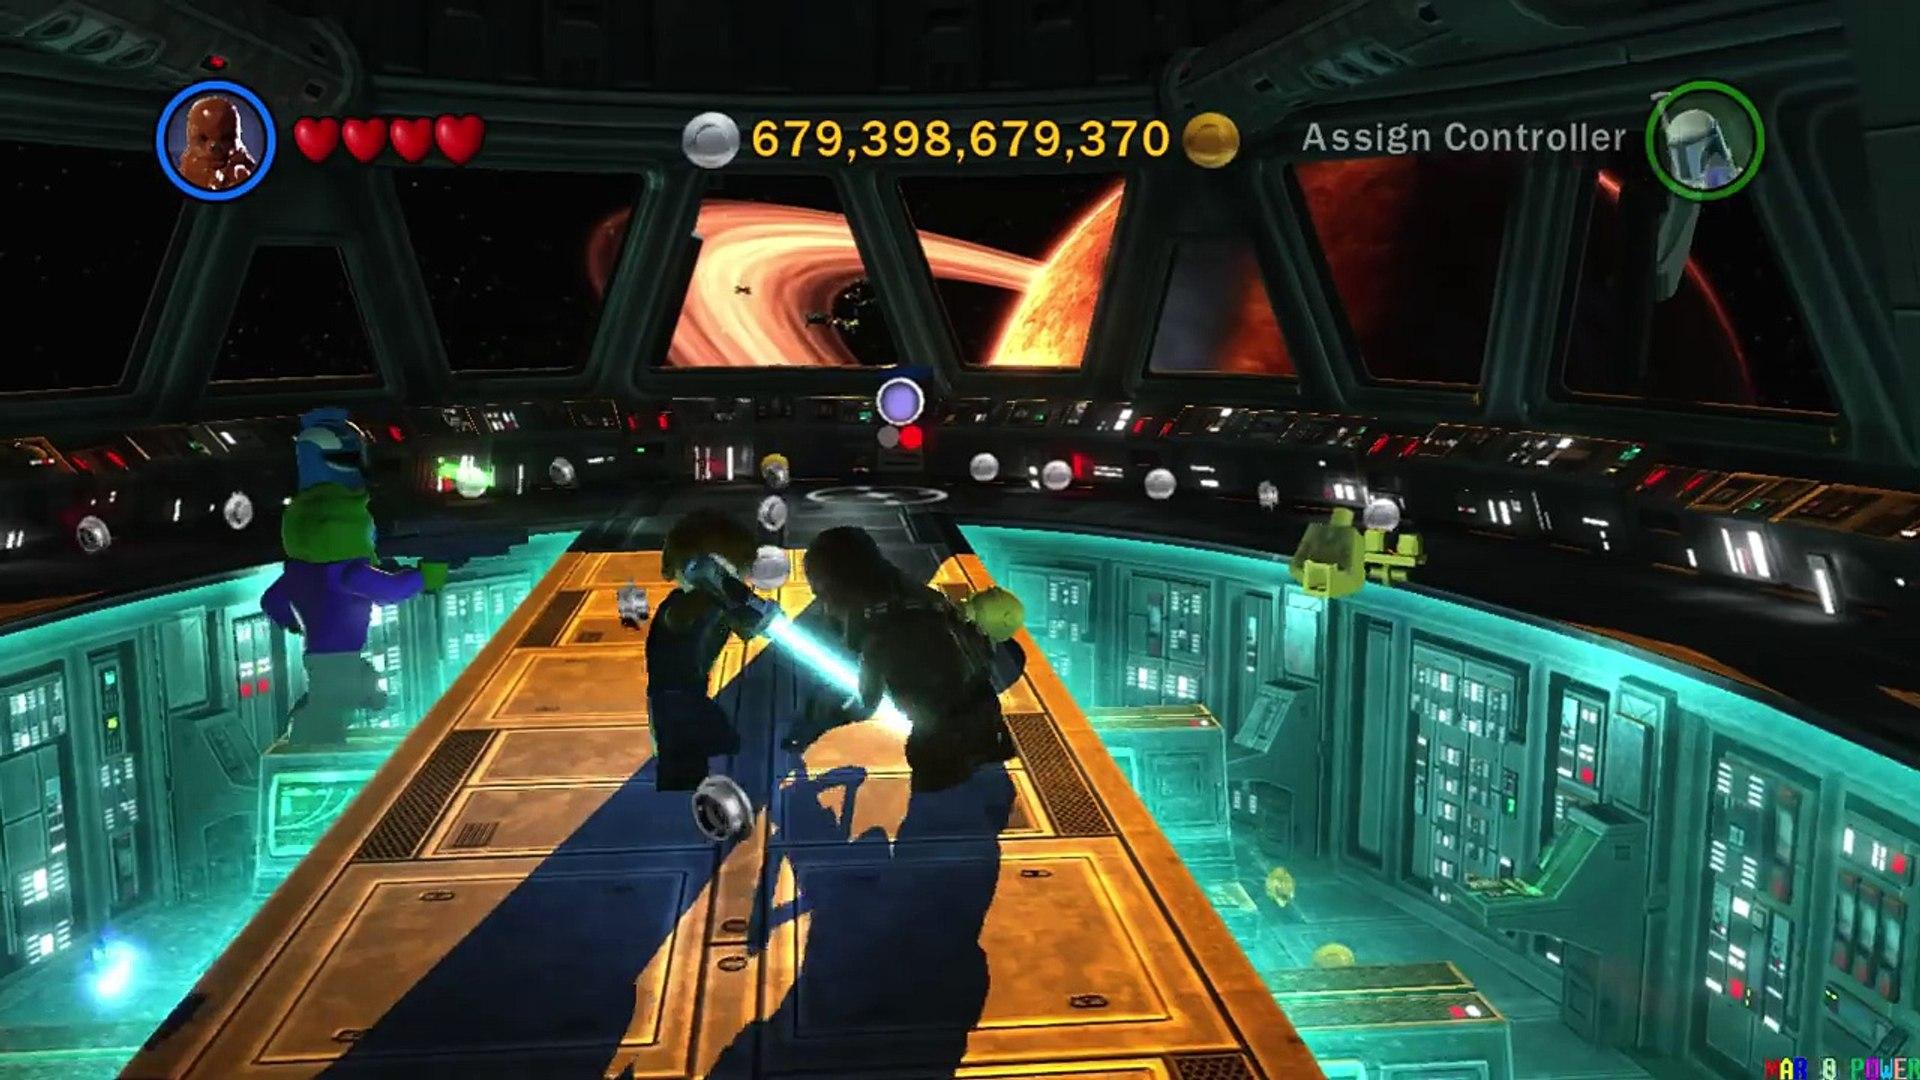 Chewbacca Evolution In Lego Star Wars Videogames